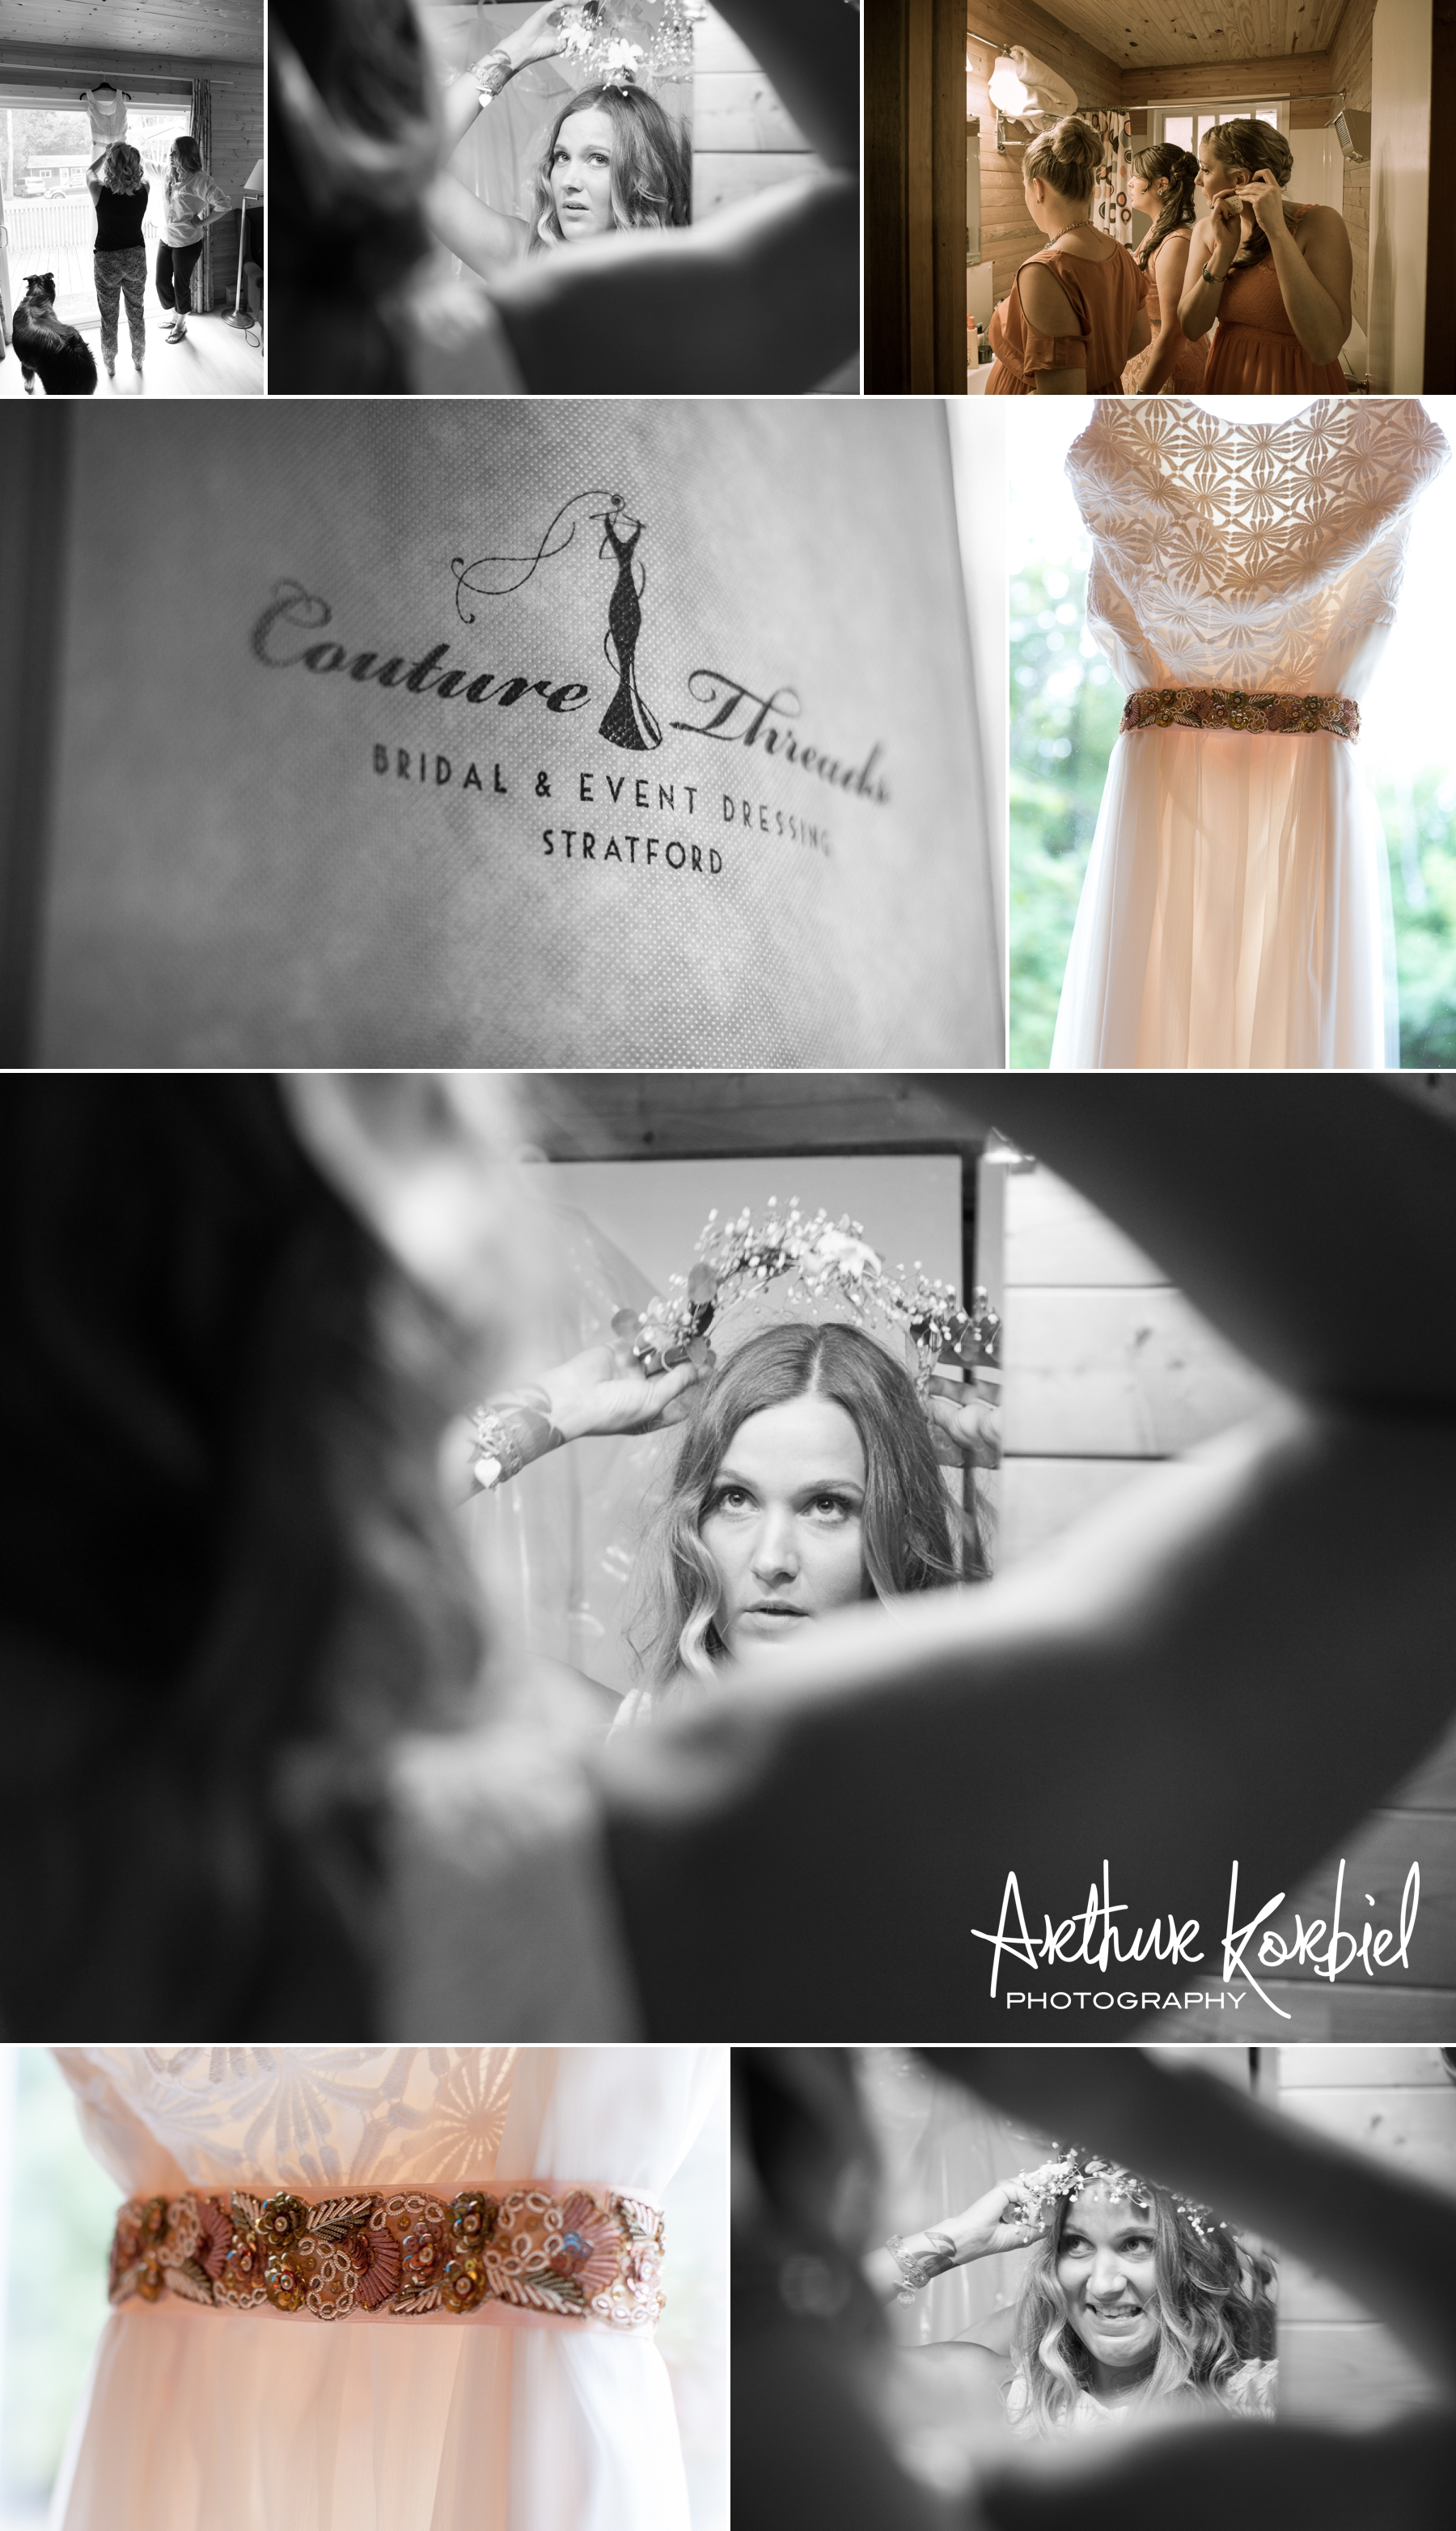 Arthur Korbiel Photography - London Engagement Photographer - Sauble Beach Barn Wedding - Samantha & Dan_004.jpg